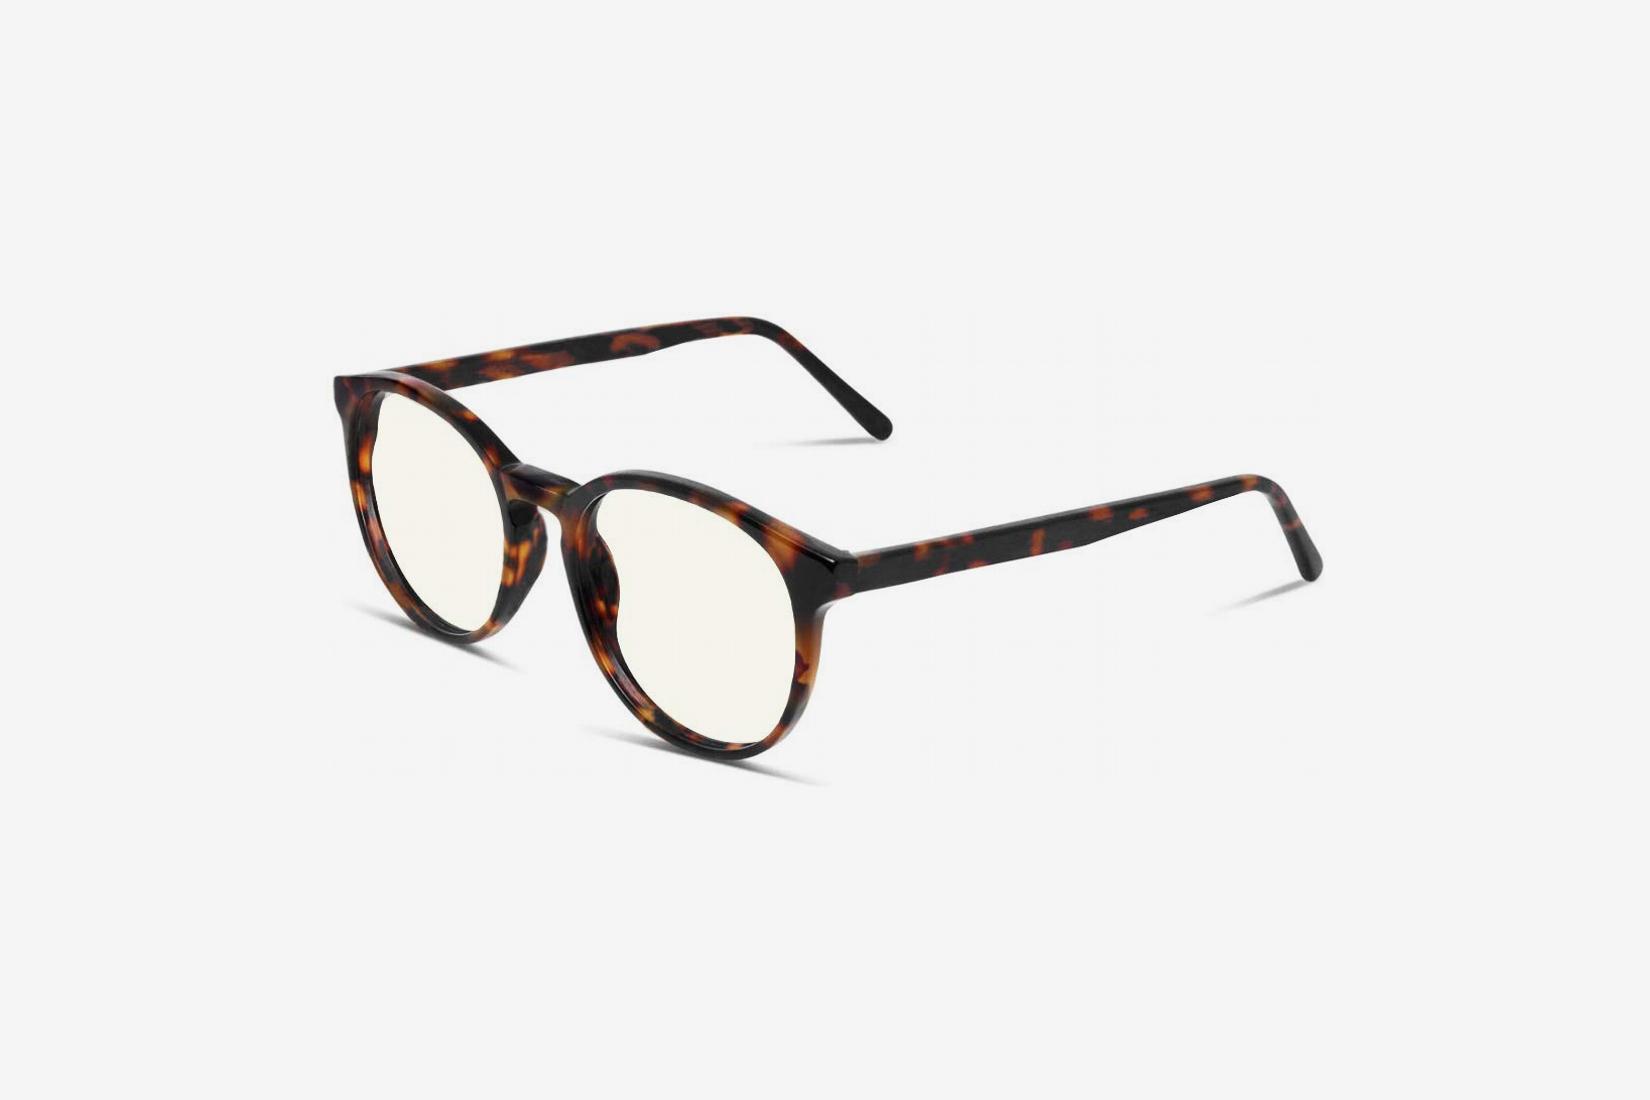 00c6a7c87618 Nouritty Eyewear Blue Light Blocking Computer Glasses at Amazon